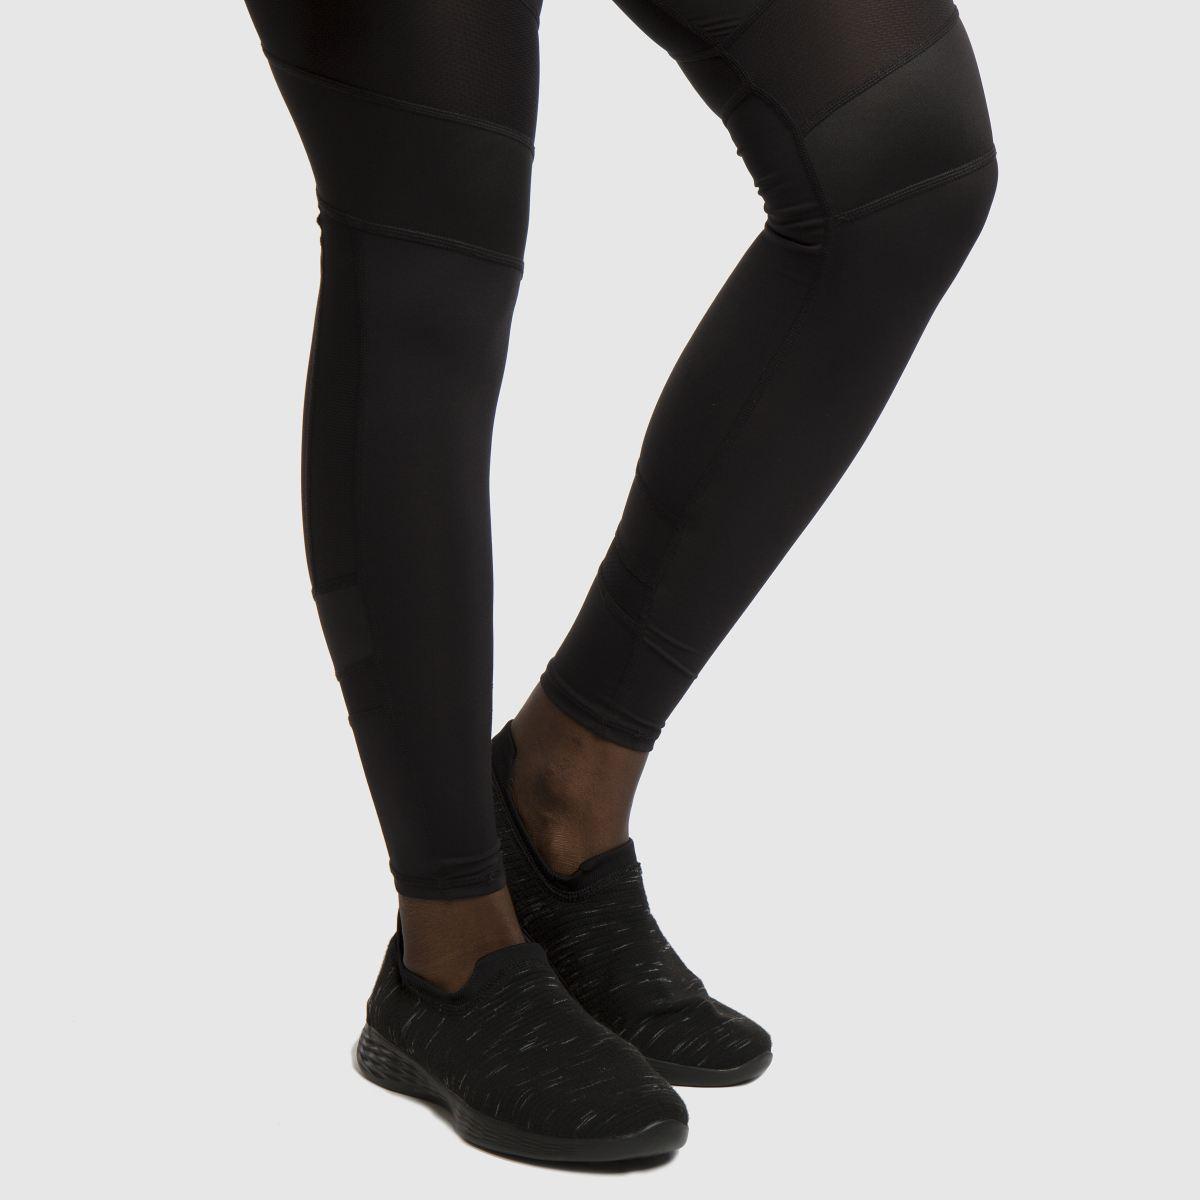 Damen Schwarz skechers You Define Grace Sneaker   schuh Gute Qualität beliebte Schuhe